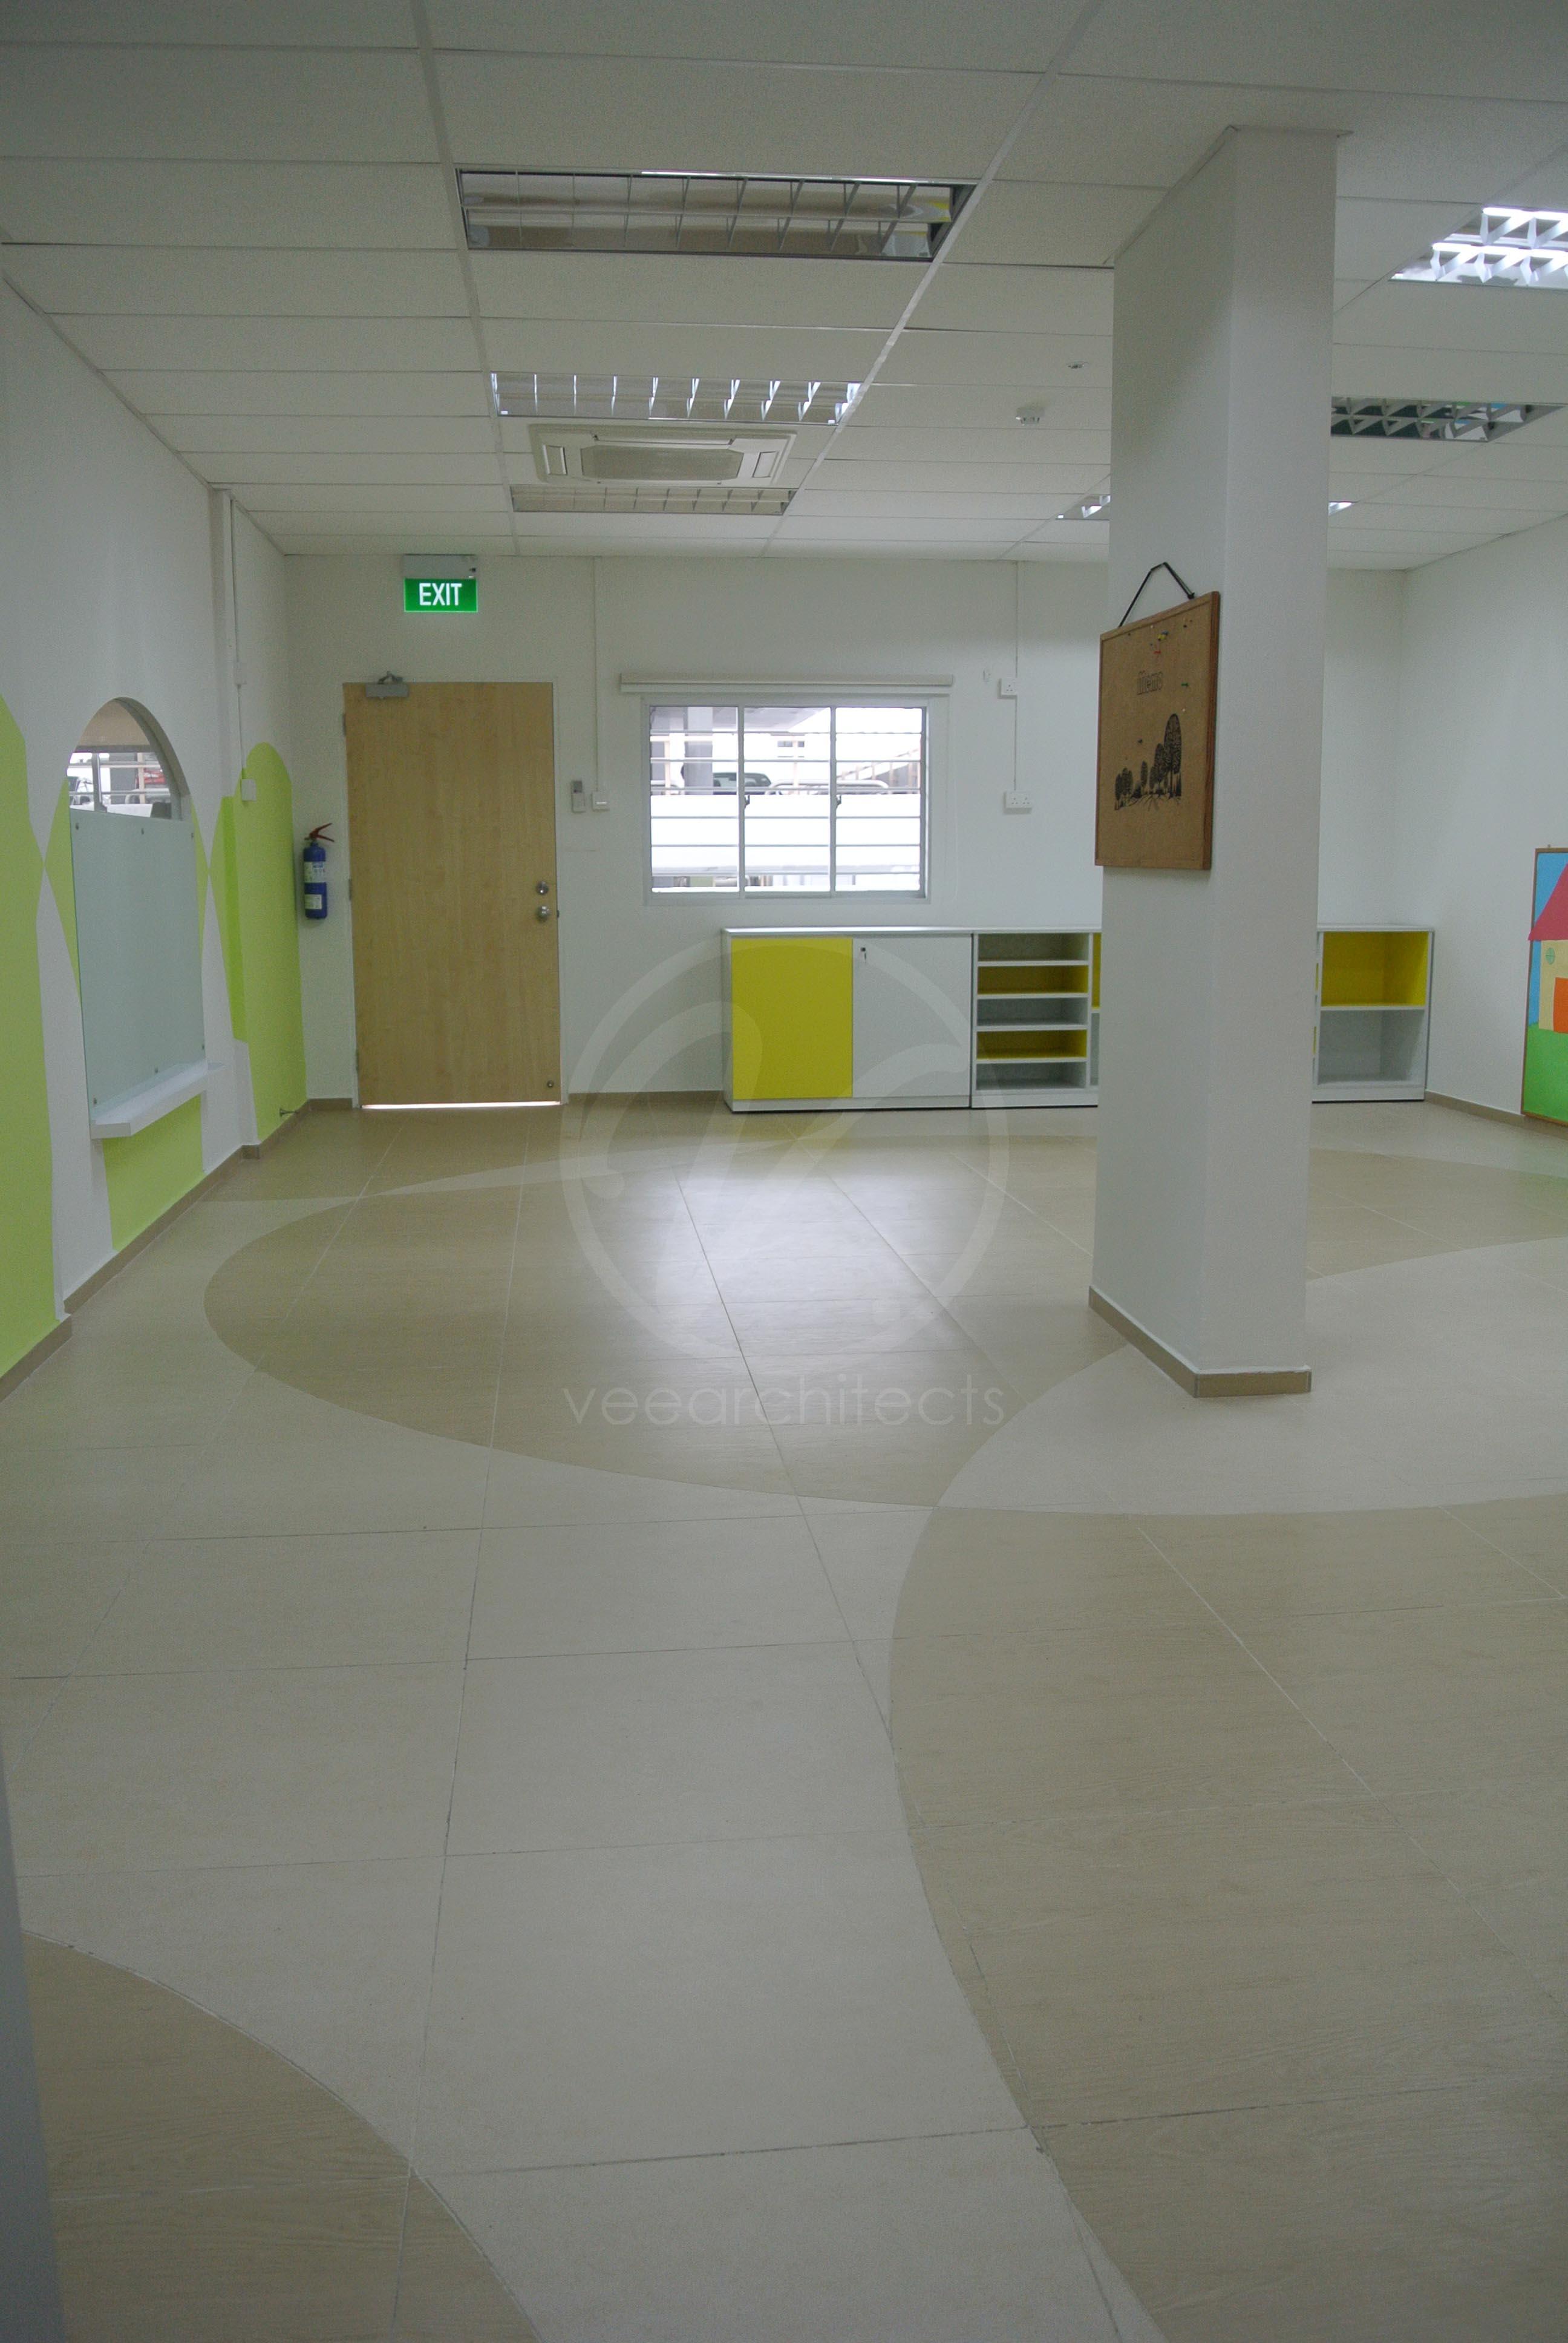 pcf preschool @ kampong glam